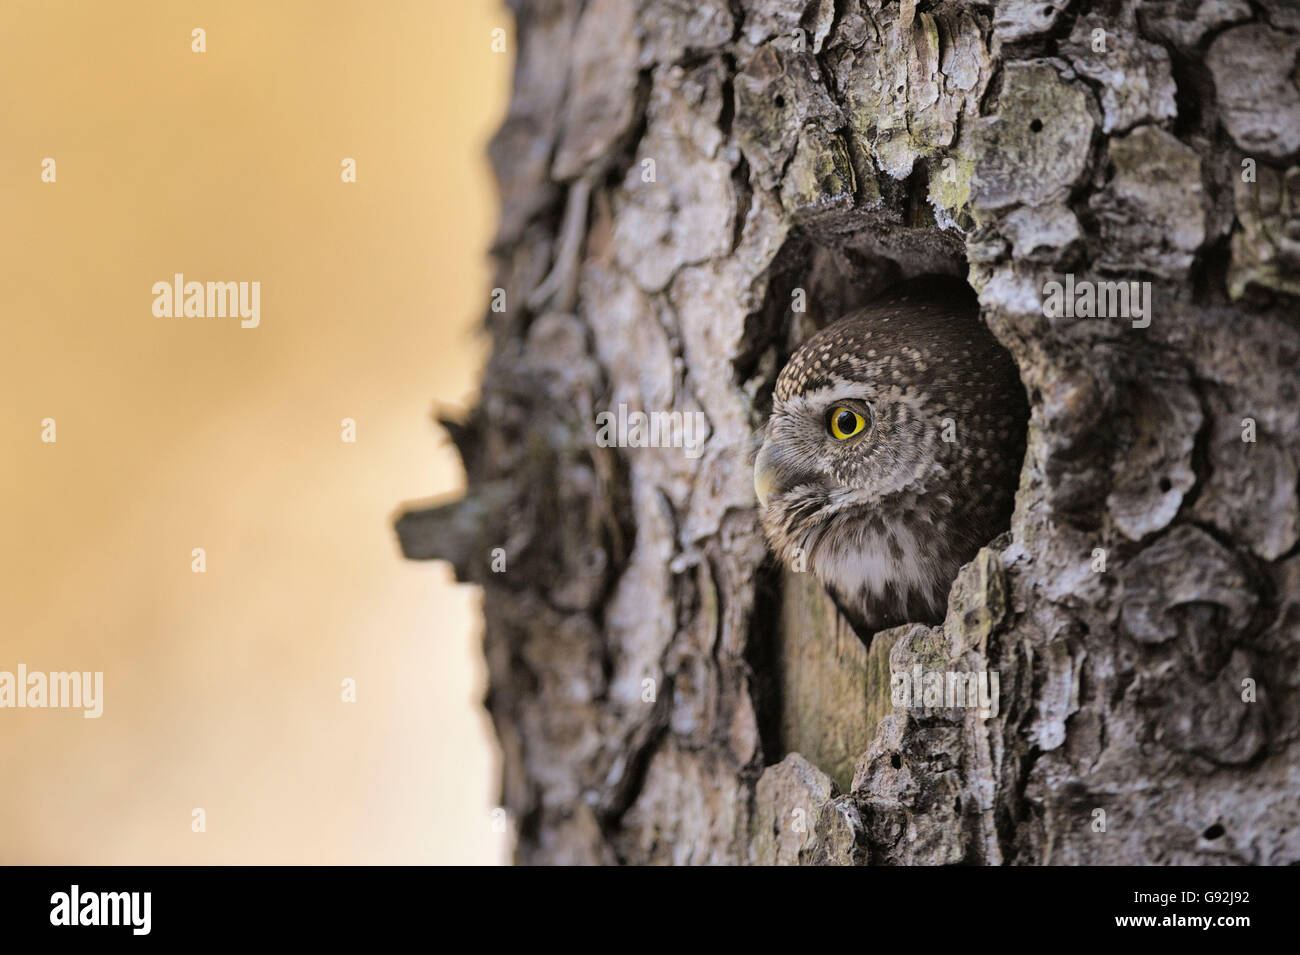 Pygmy Owl looking out of nesting hole / (Glaucidium passerinum) - Stock Image